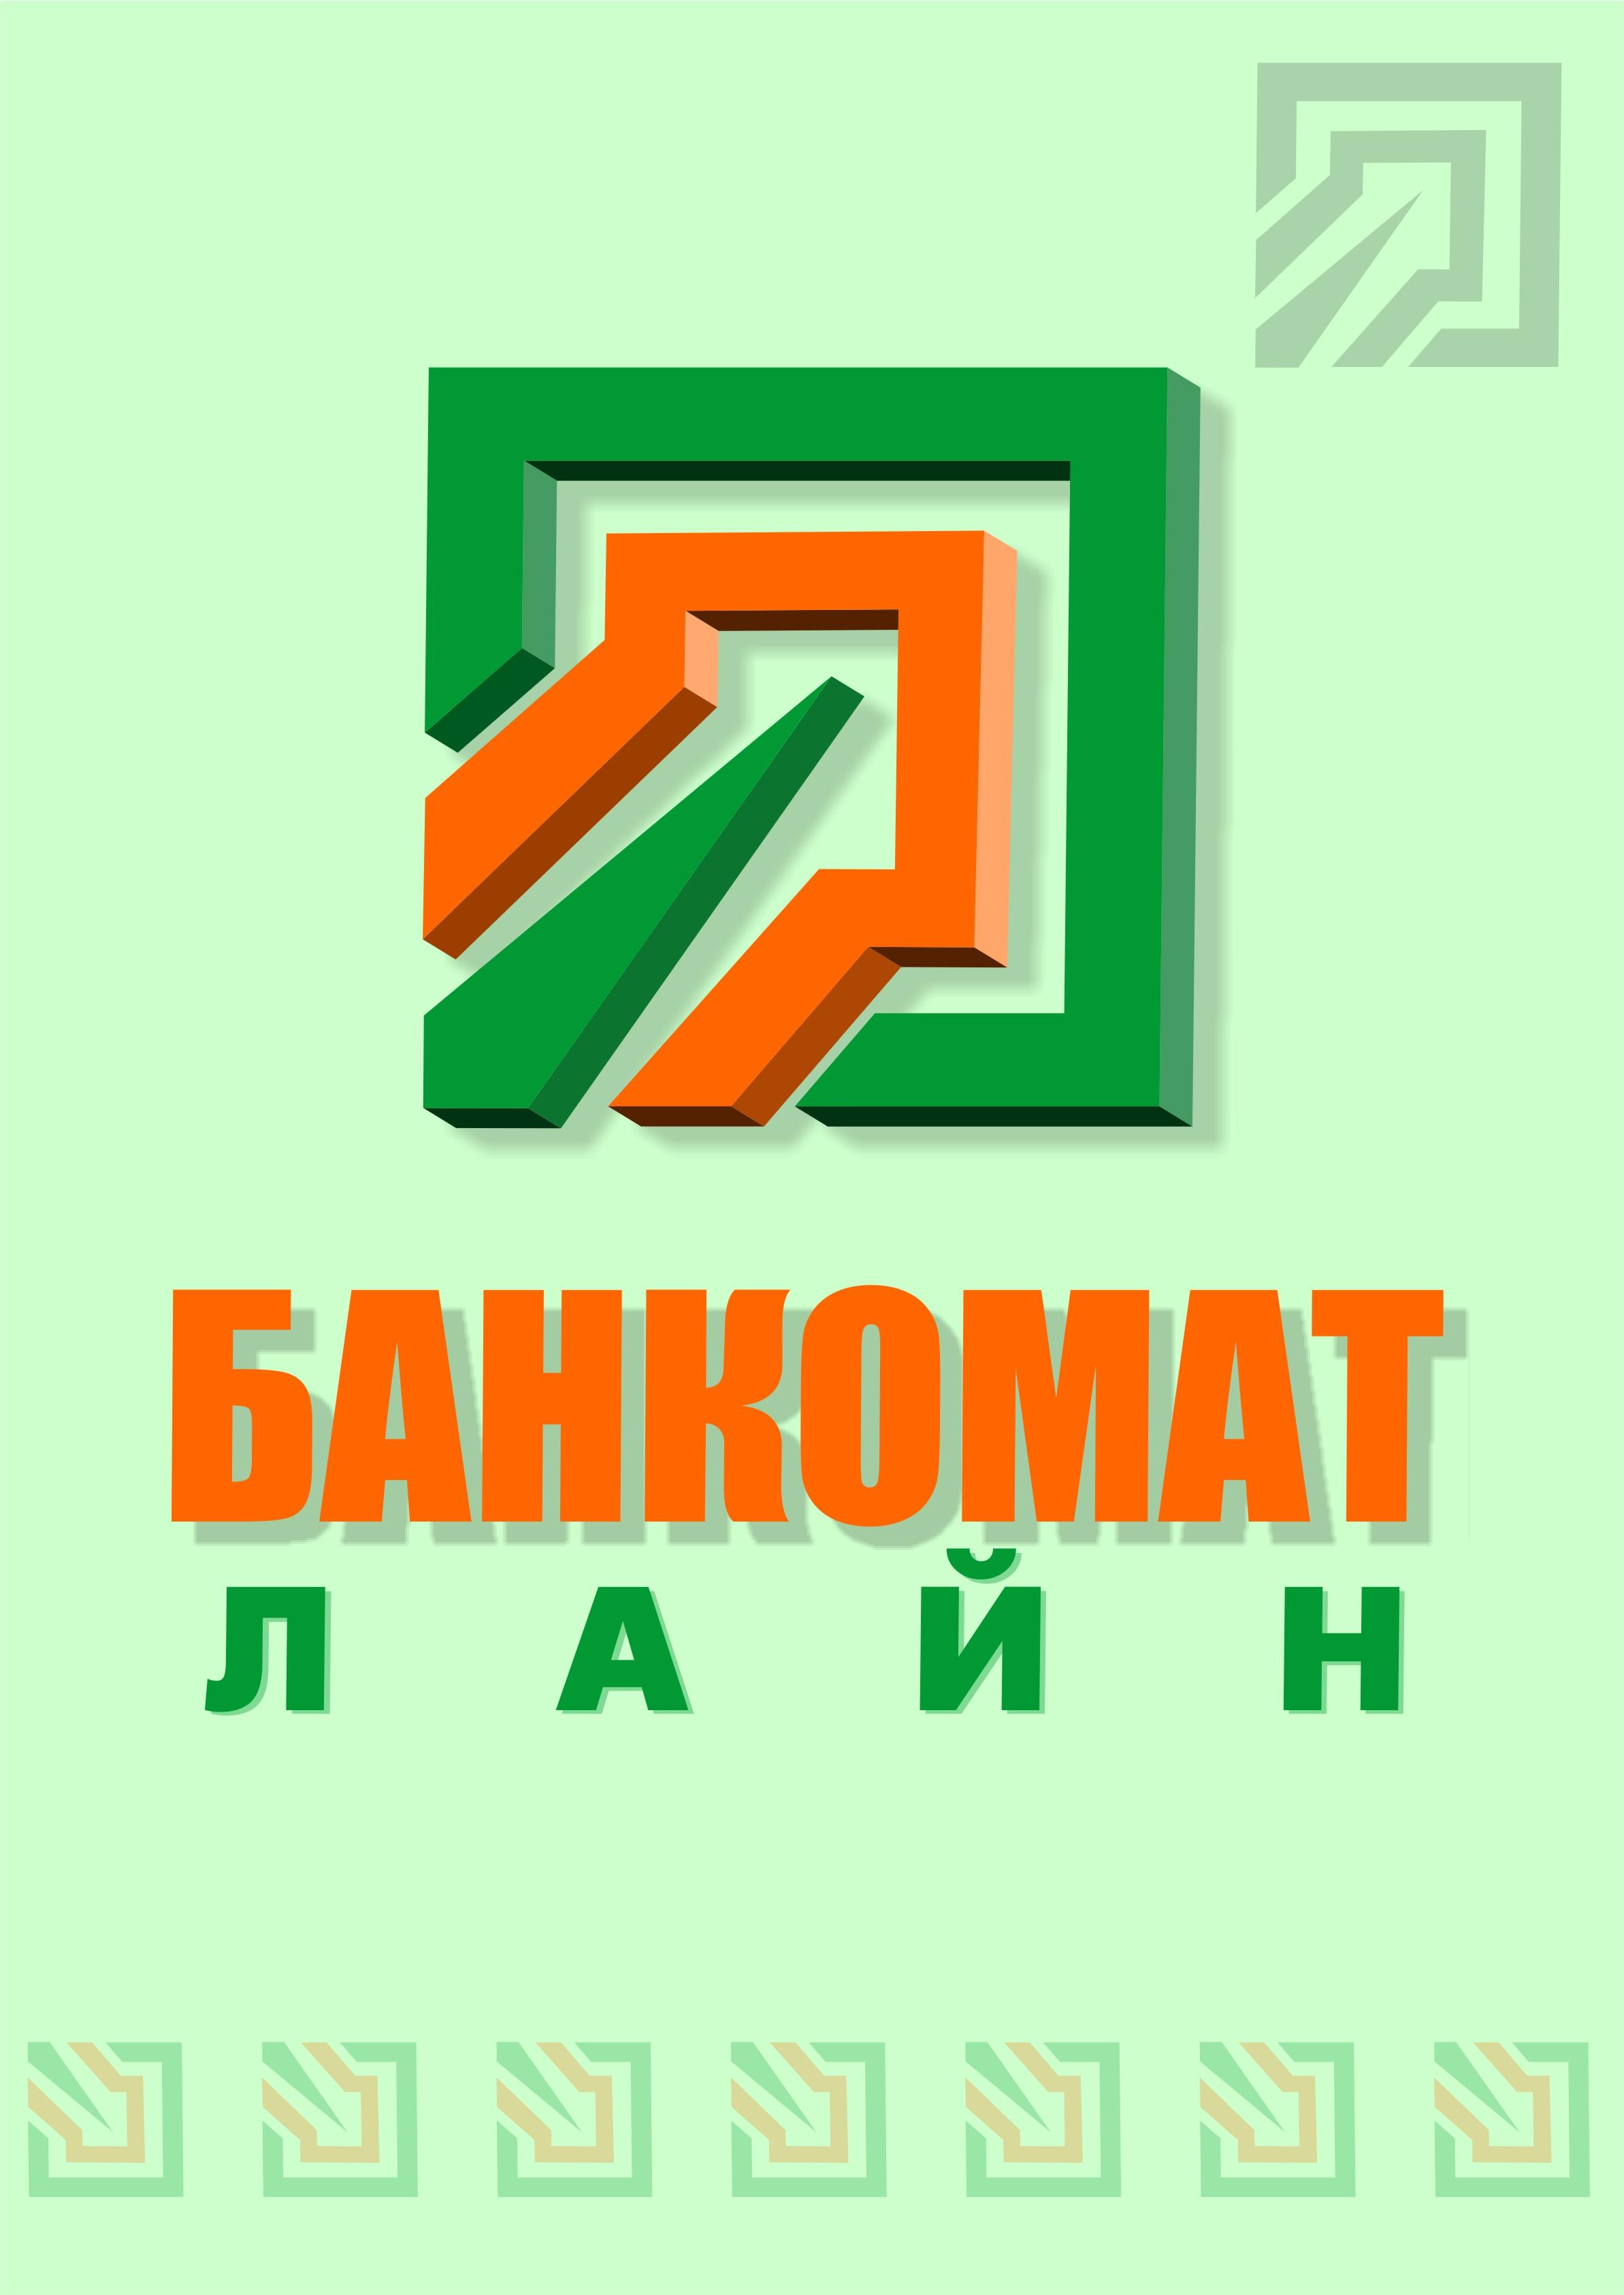 Разработка логотипа и слогана для транспортной компании фото f_9655878e5459f6f1.jpg